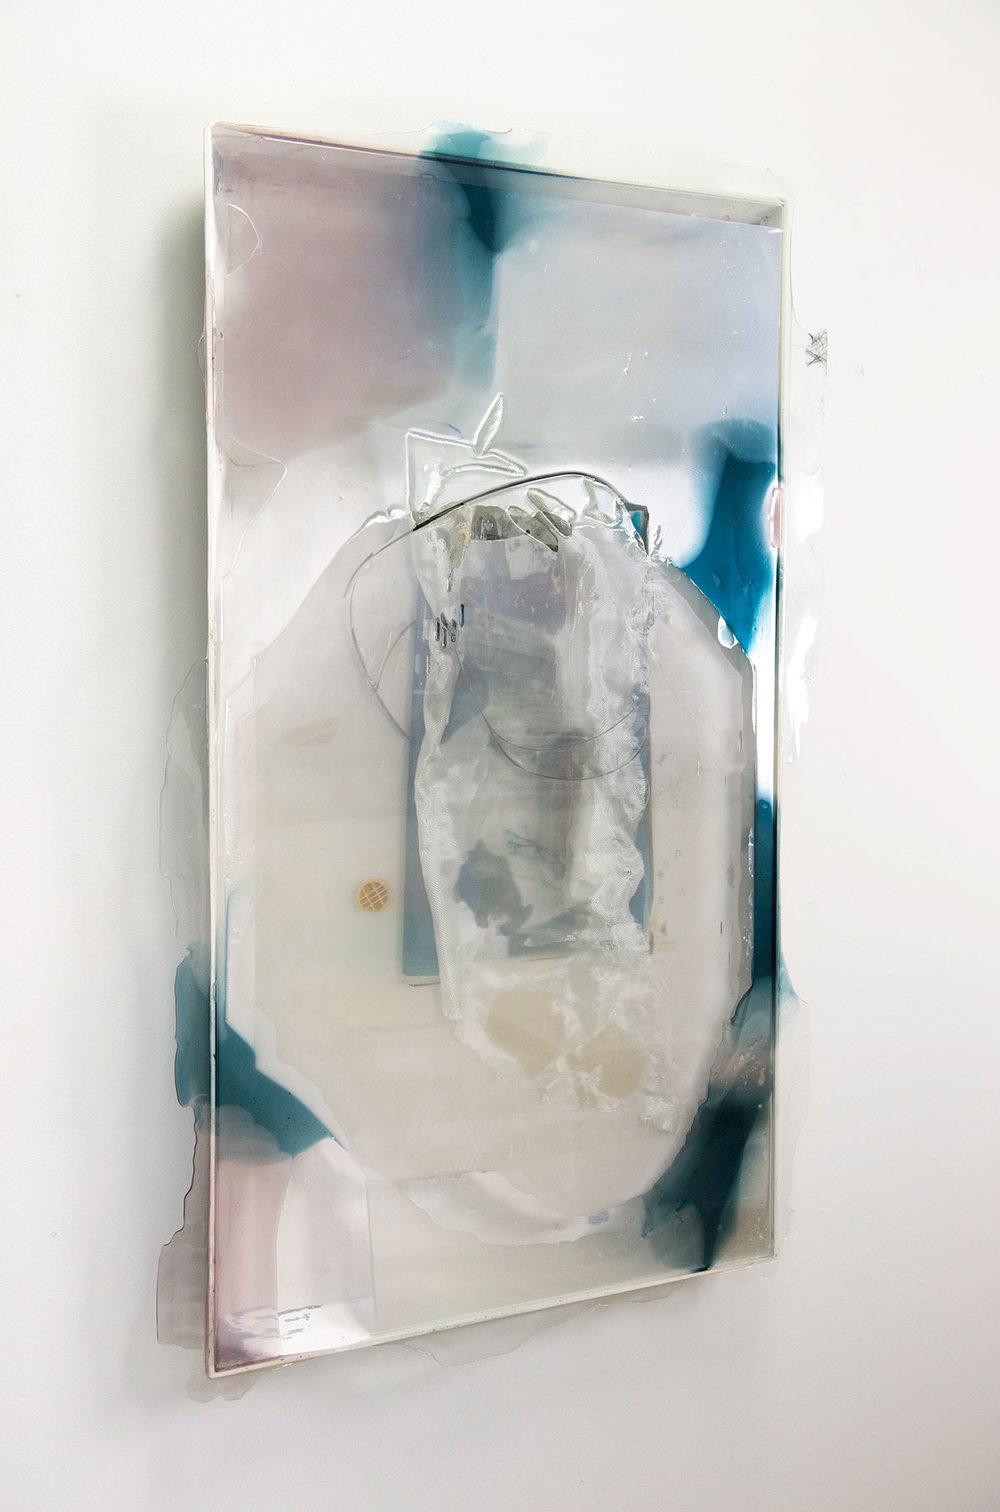 Simon Preston Gallery - 1 Rivington Street, New York, NY 10002Showing: A selection of works by Josh TonsfeldtJosh Tonsfeldt \ Untitled, 2018